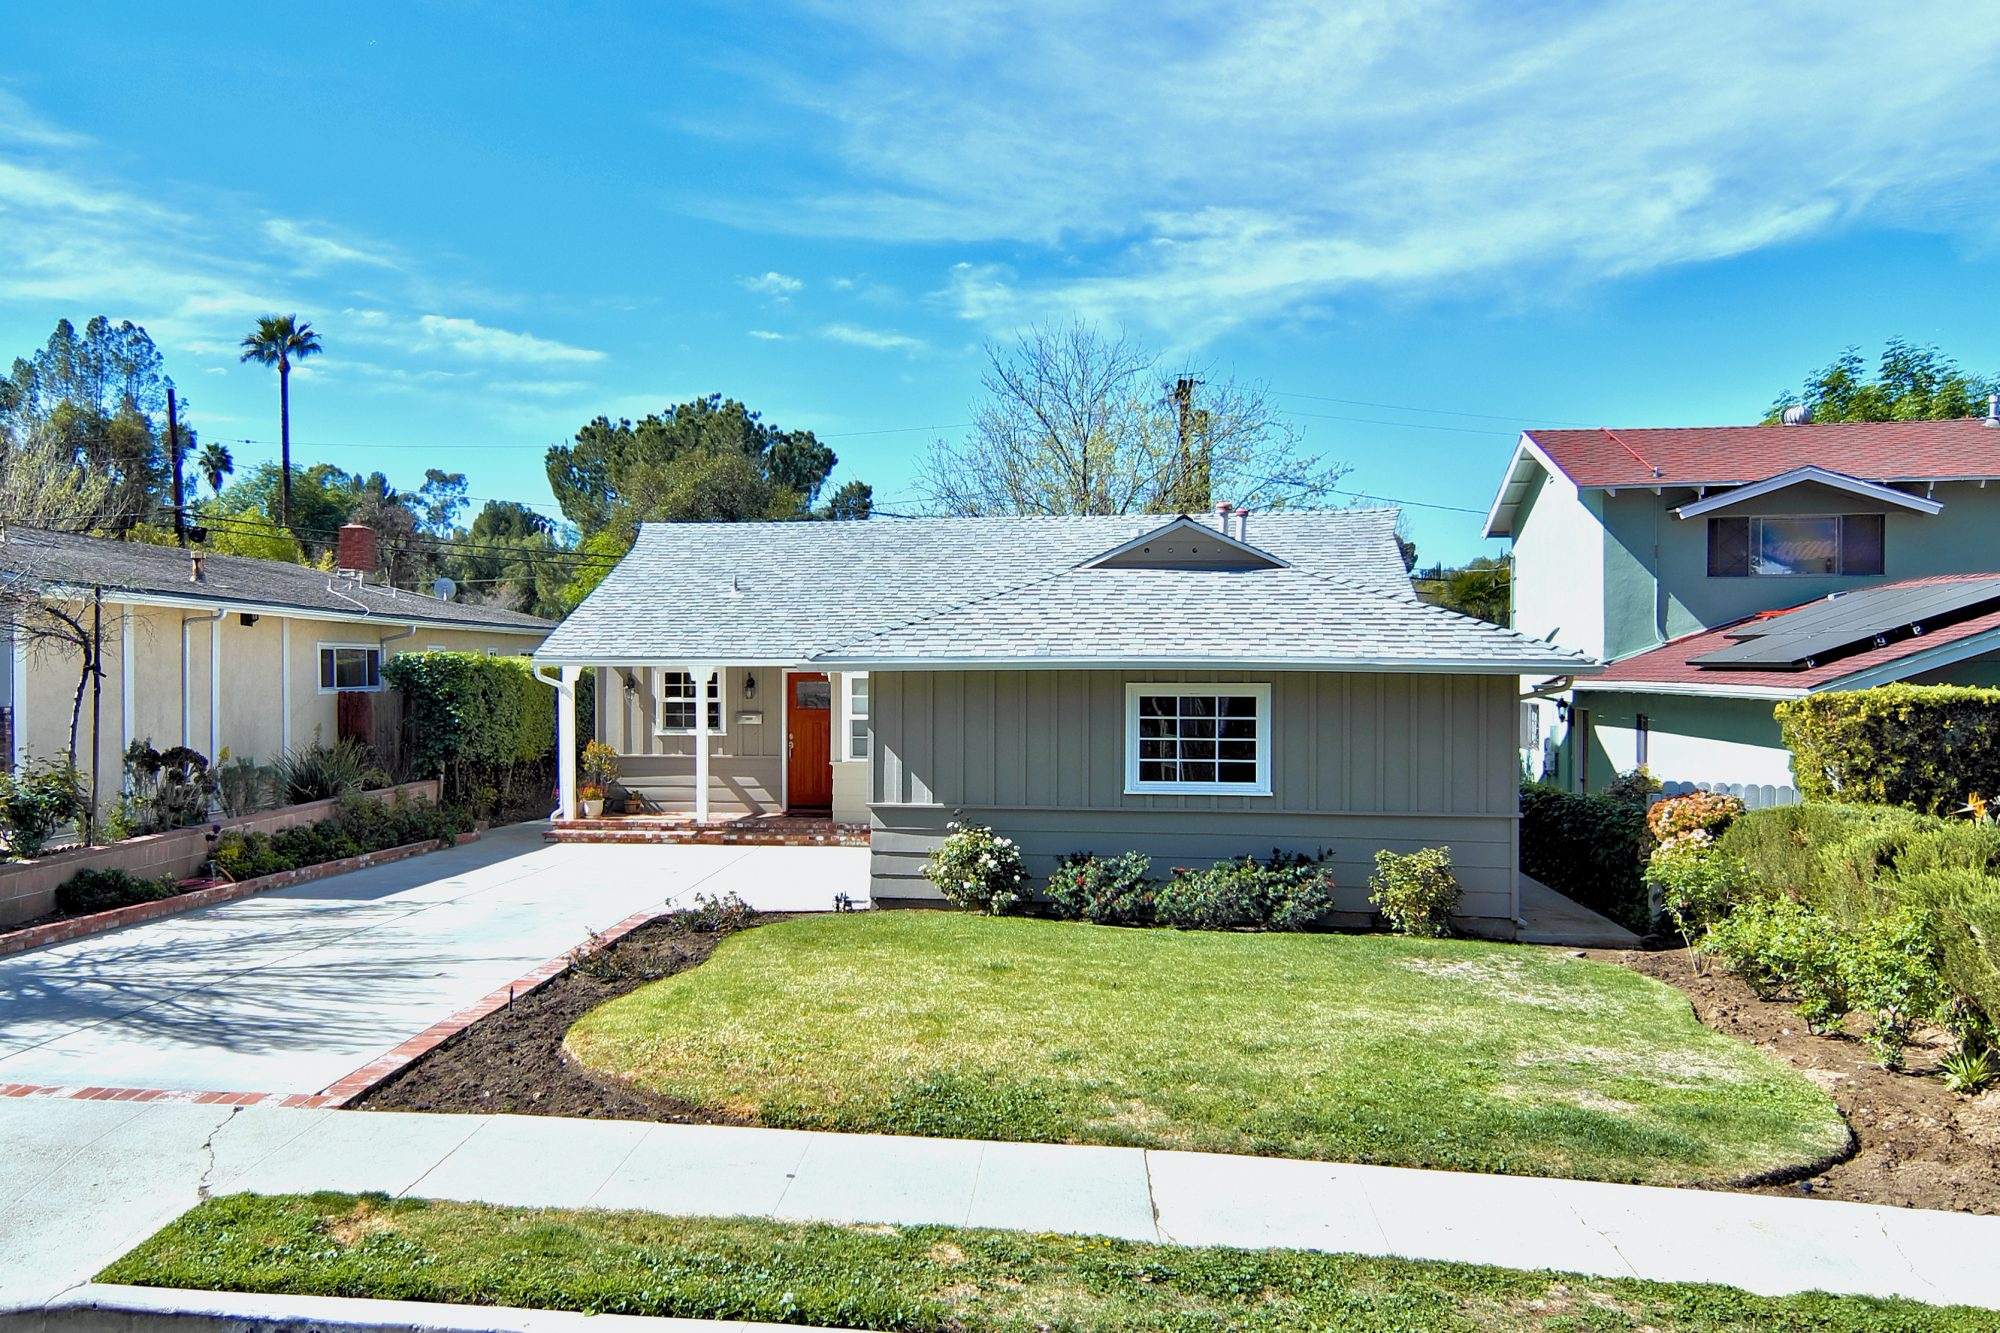 4733 Don Pio Dr, Woodland Hills, CA 91364